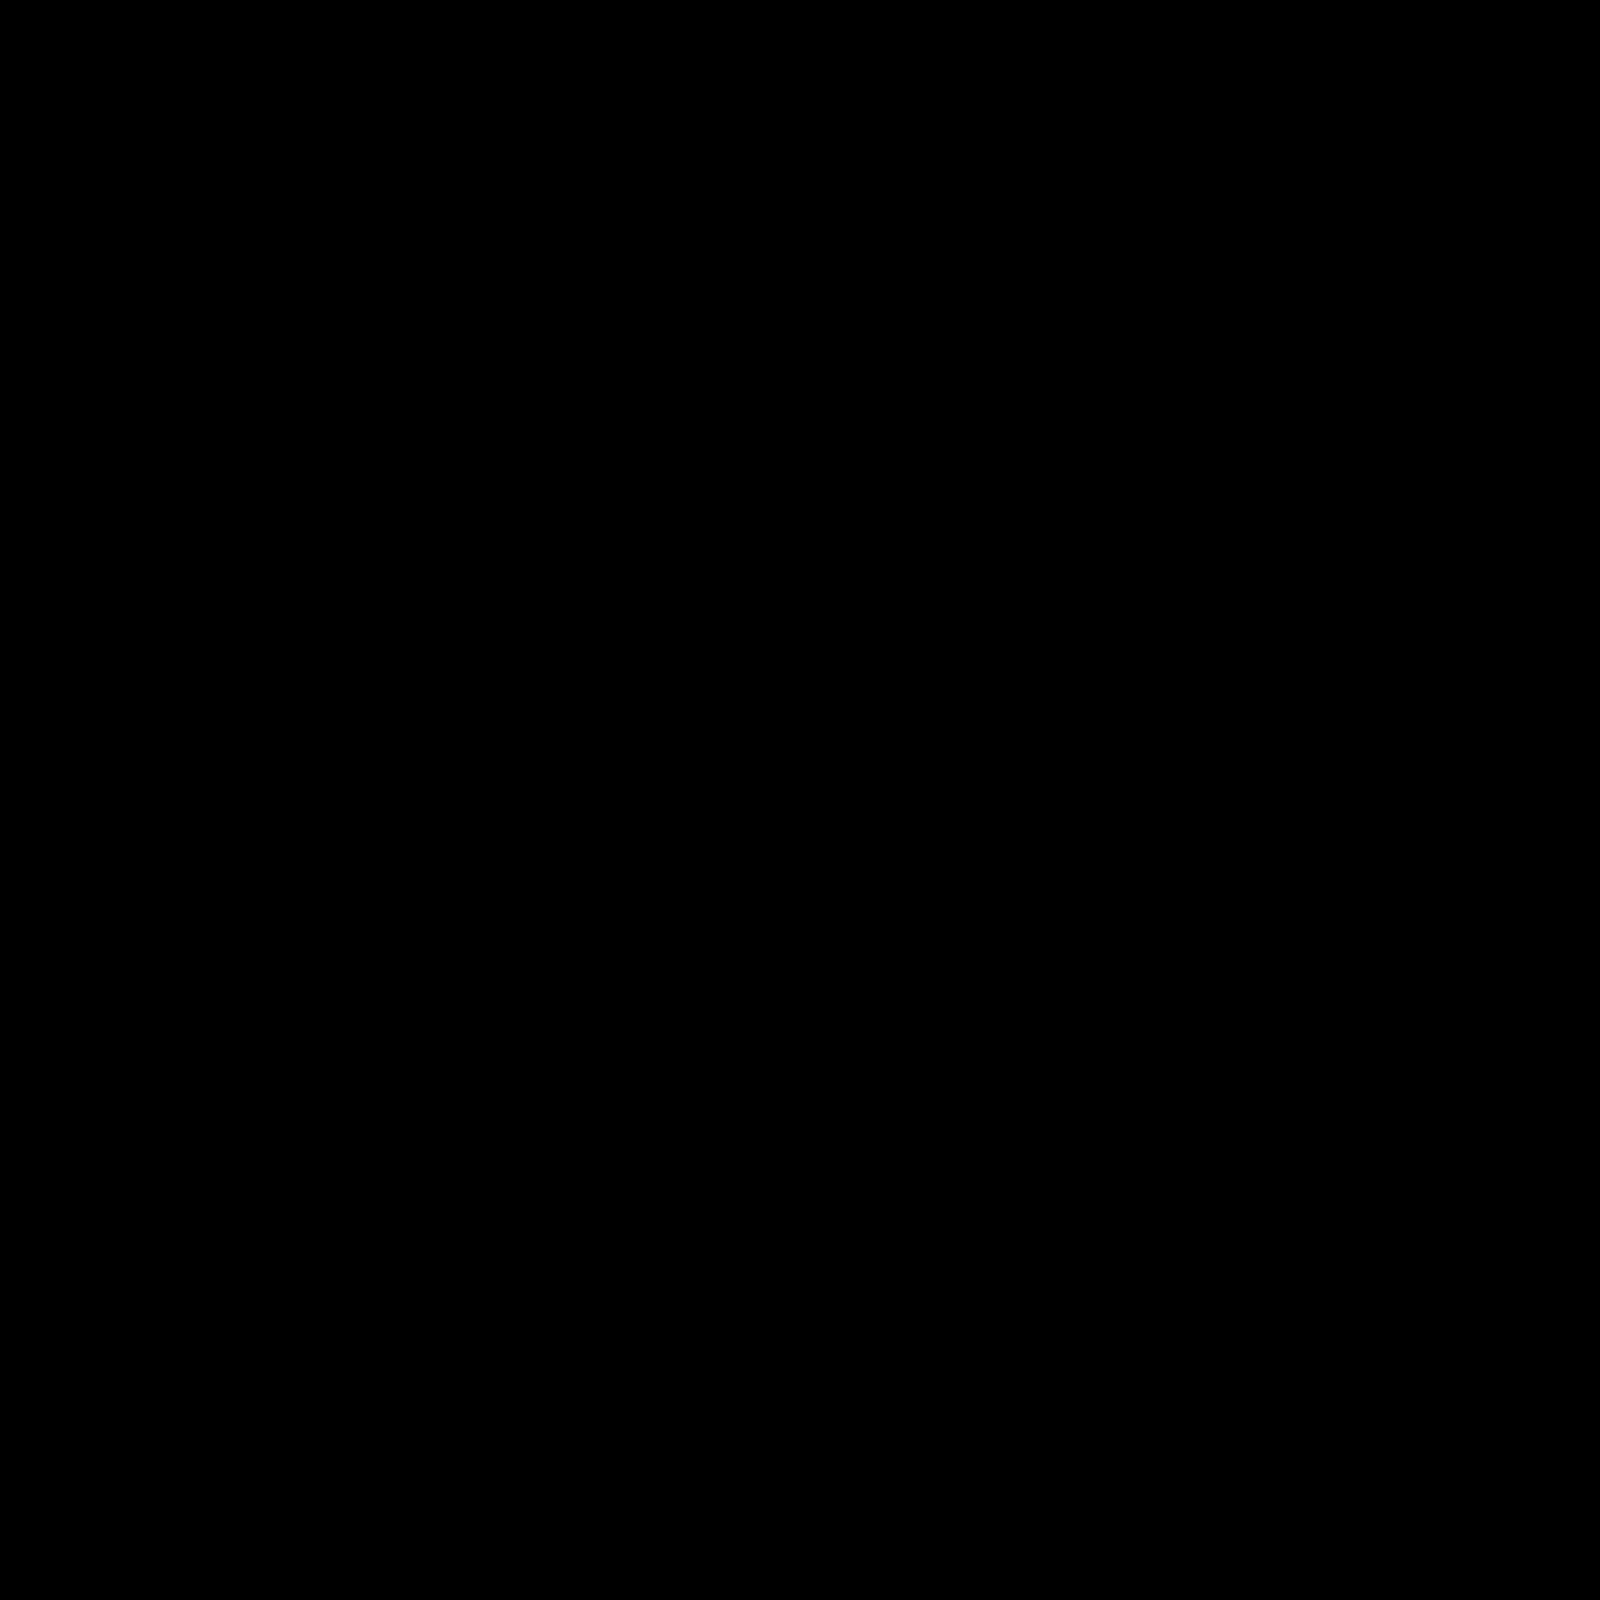 Warning Shield Filled icon